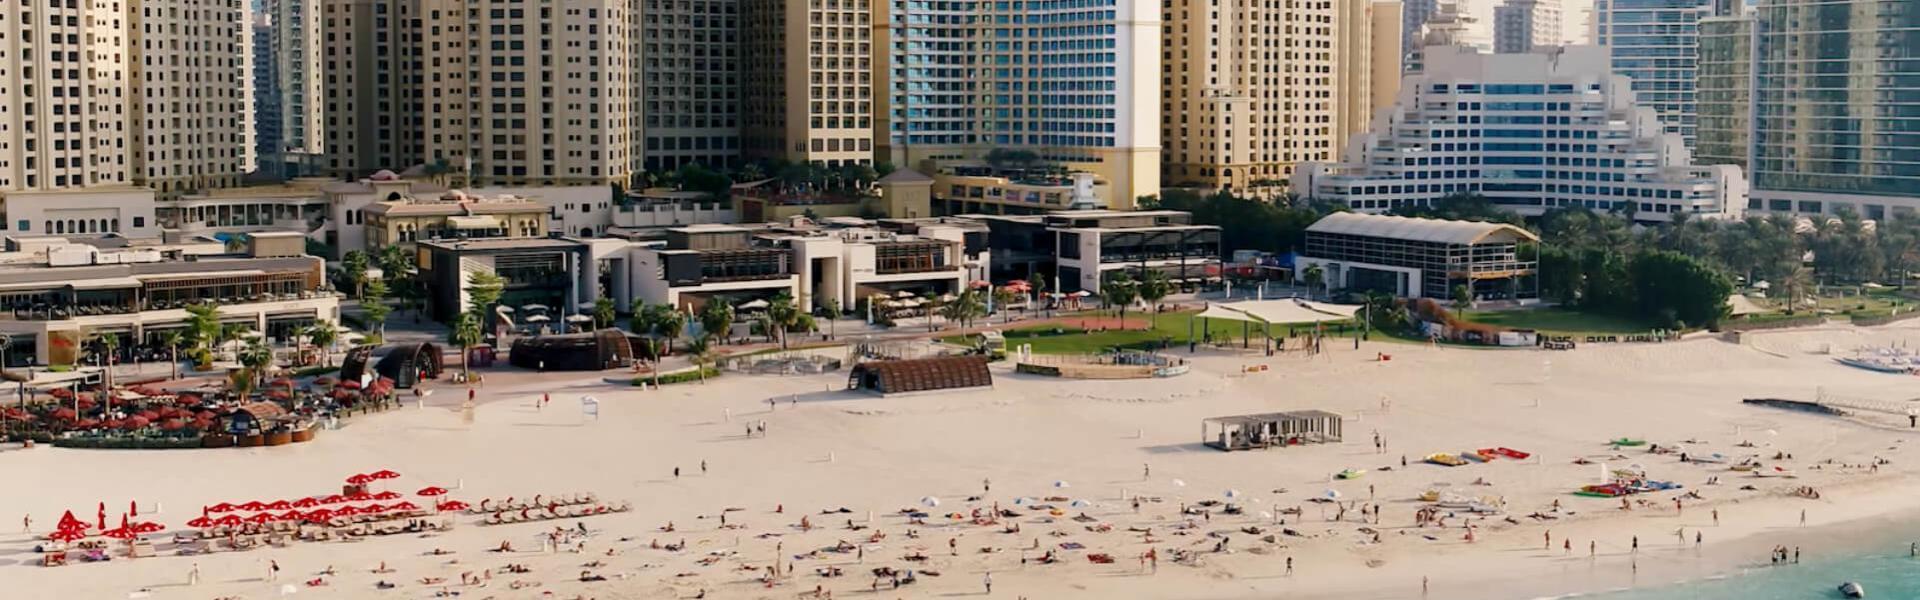 JA Ocean View Hotel (Dubai utazások)